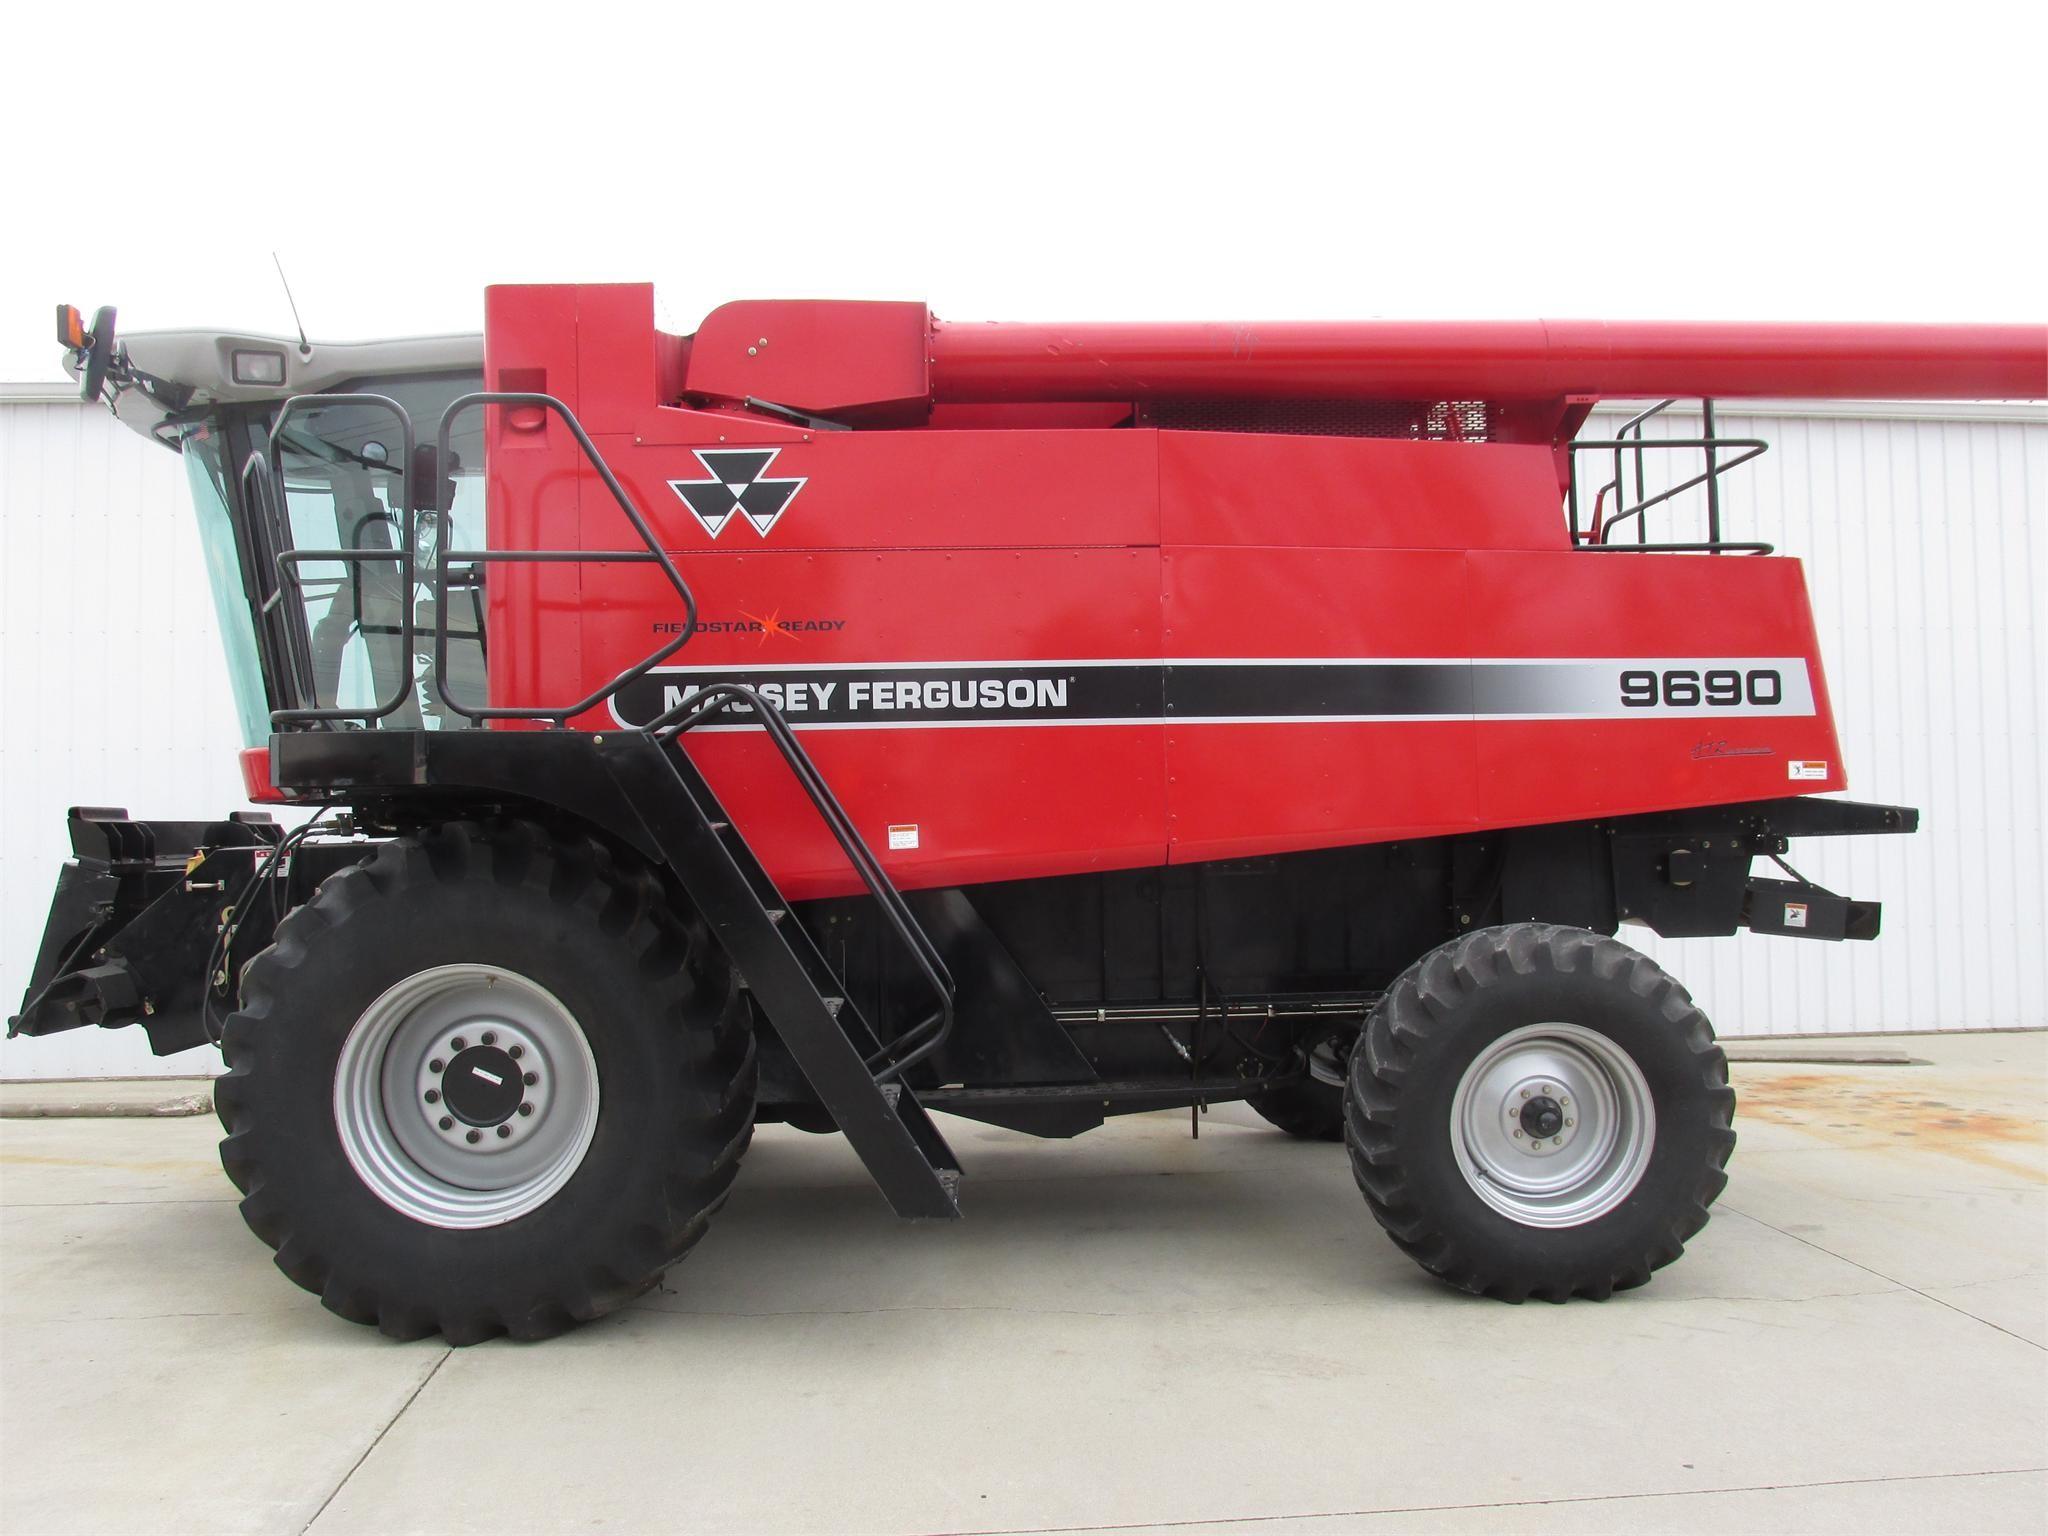 2005 Massey Ferguson 9690 Combine